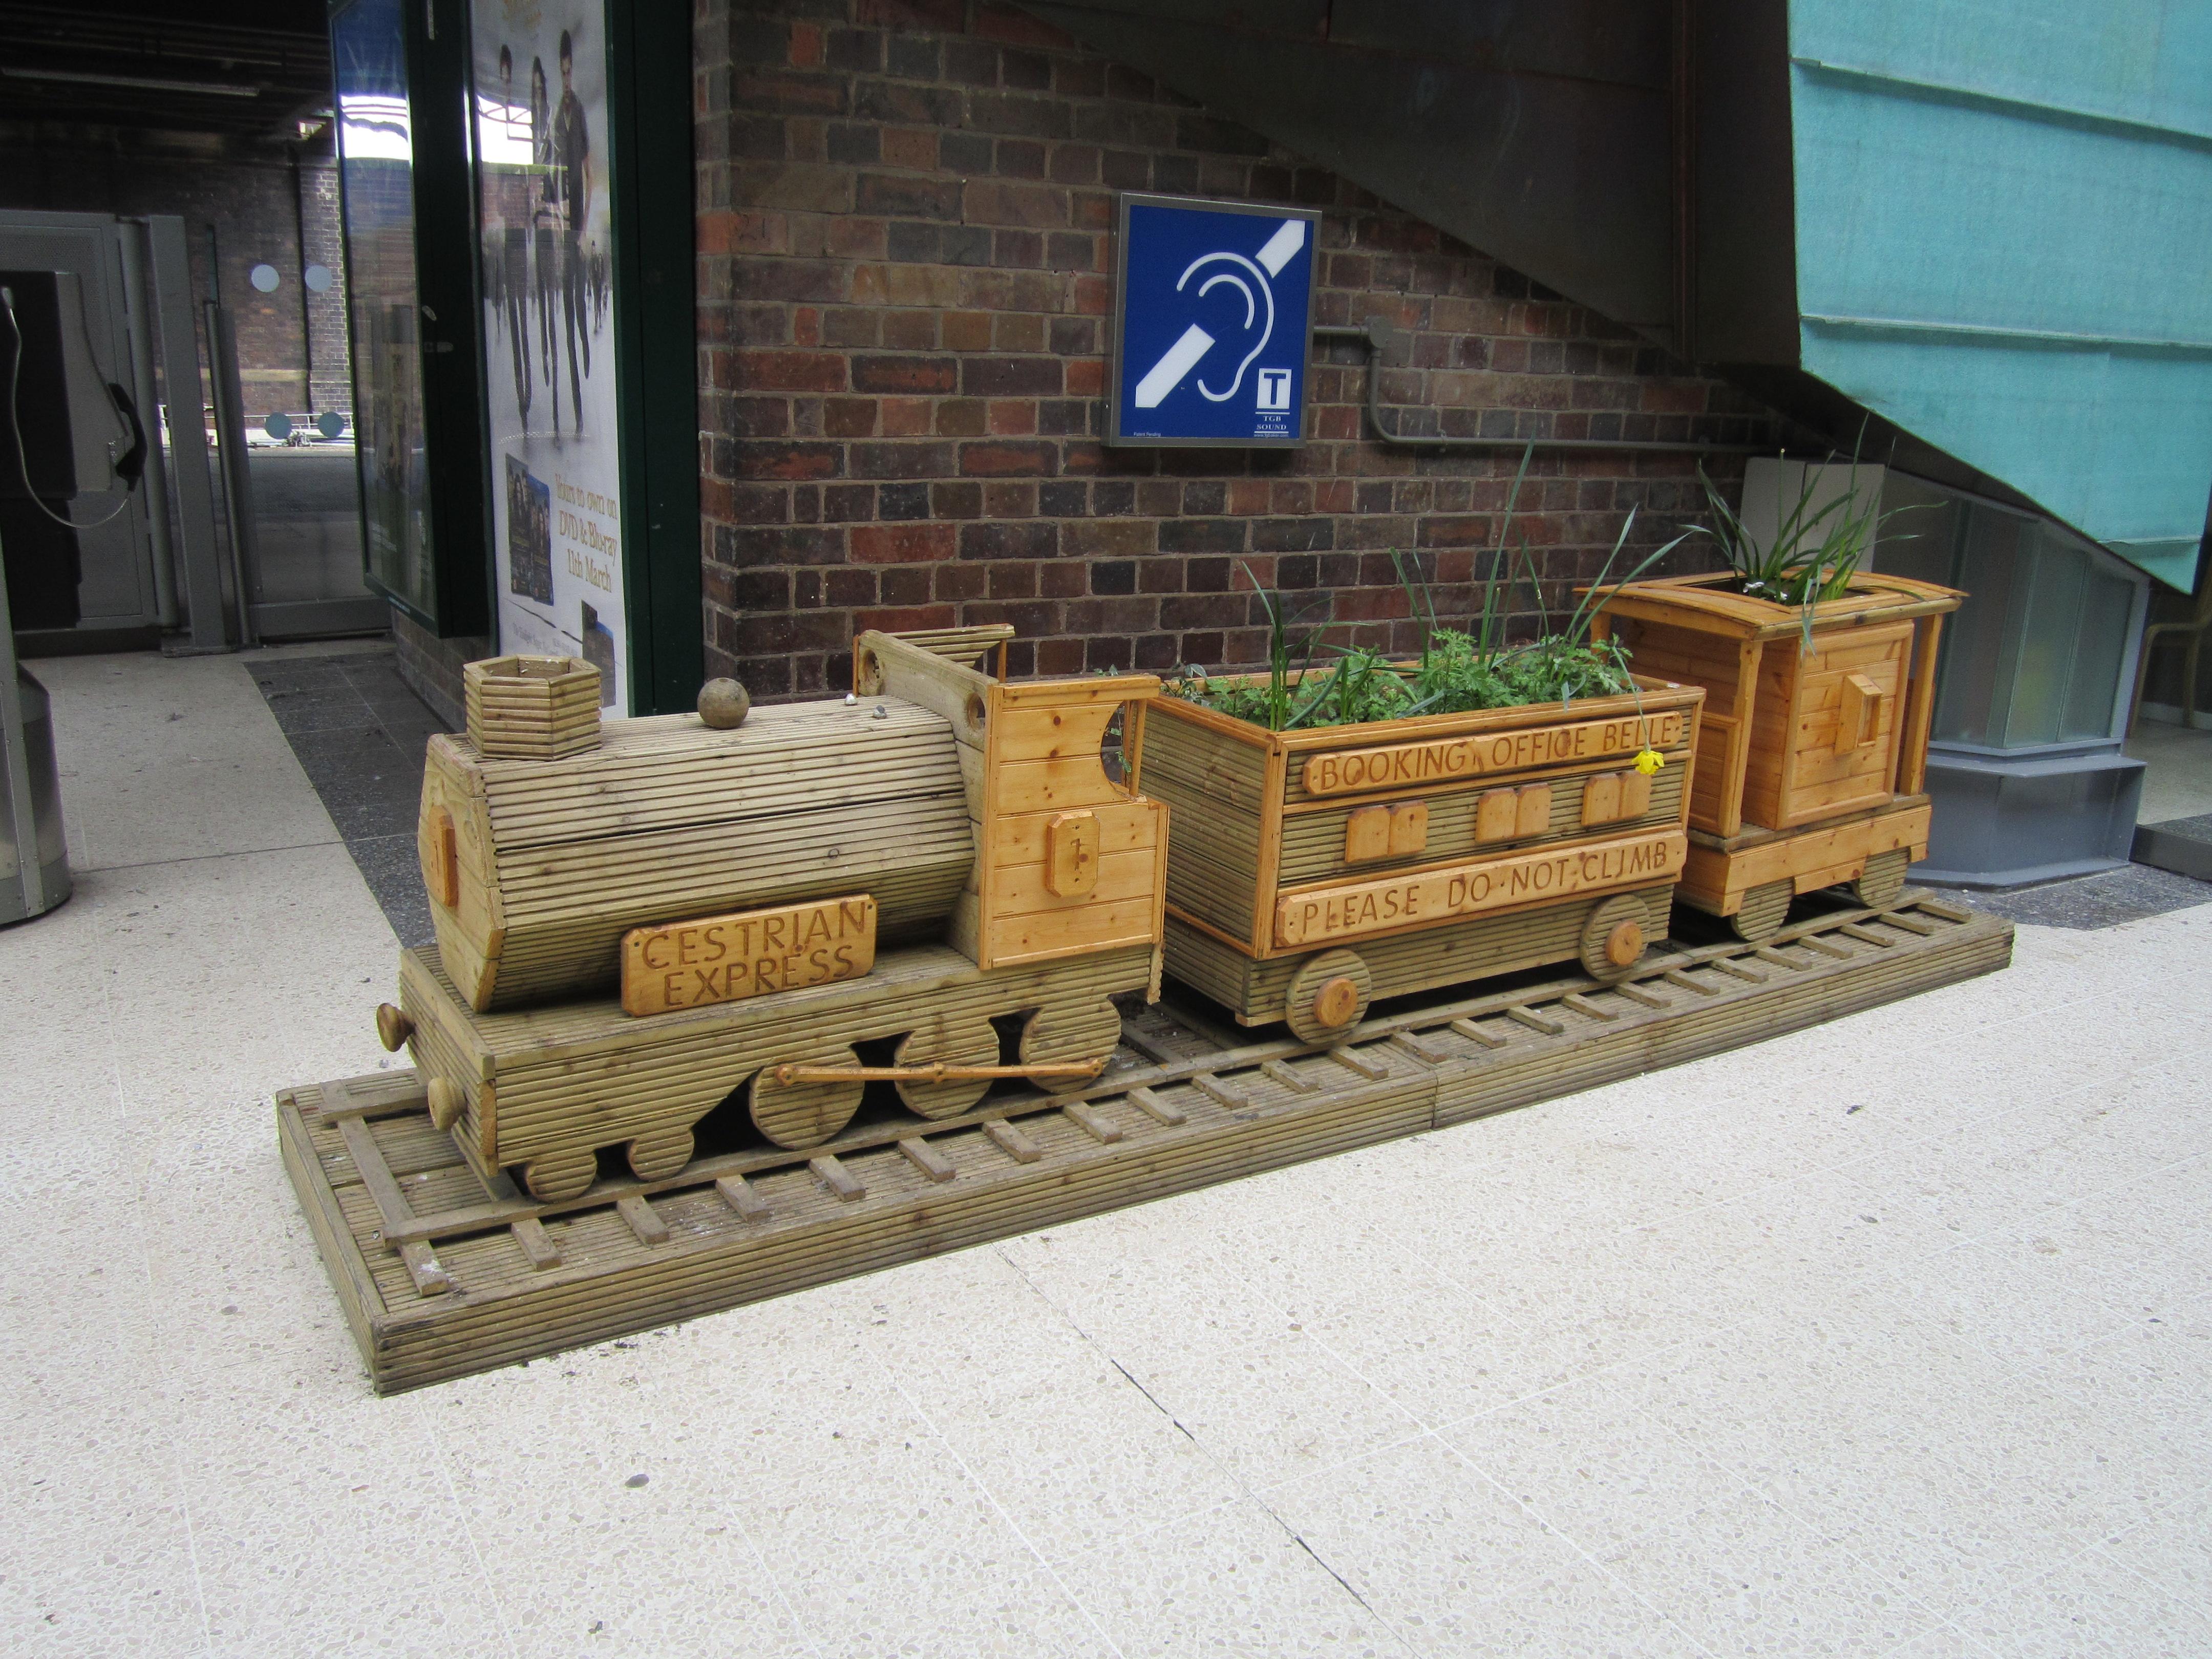 File Cestrian Express Model Train Planter Chester Railway Station